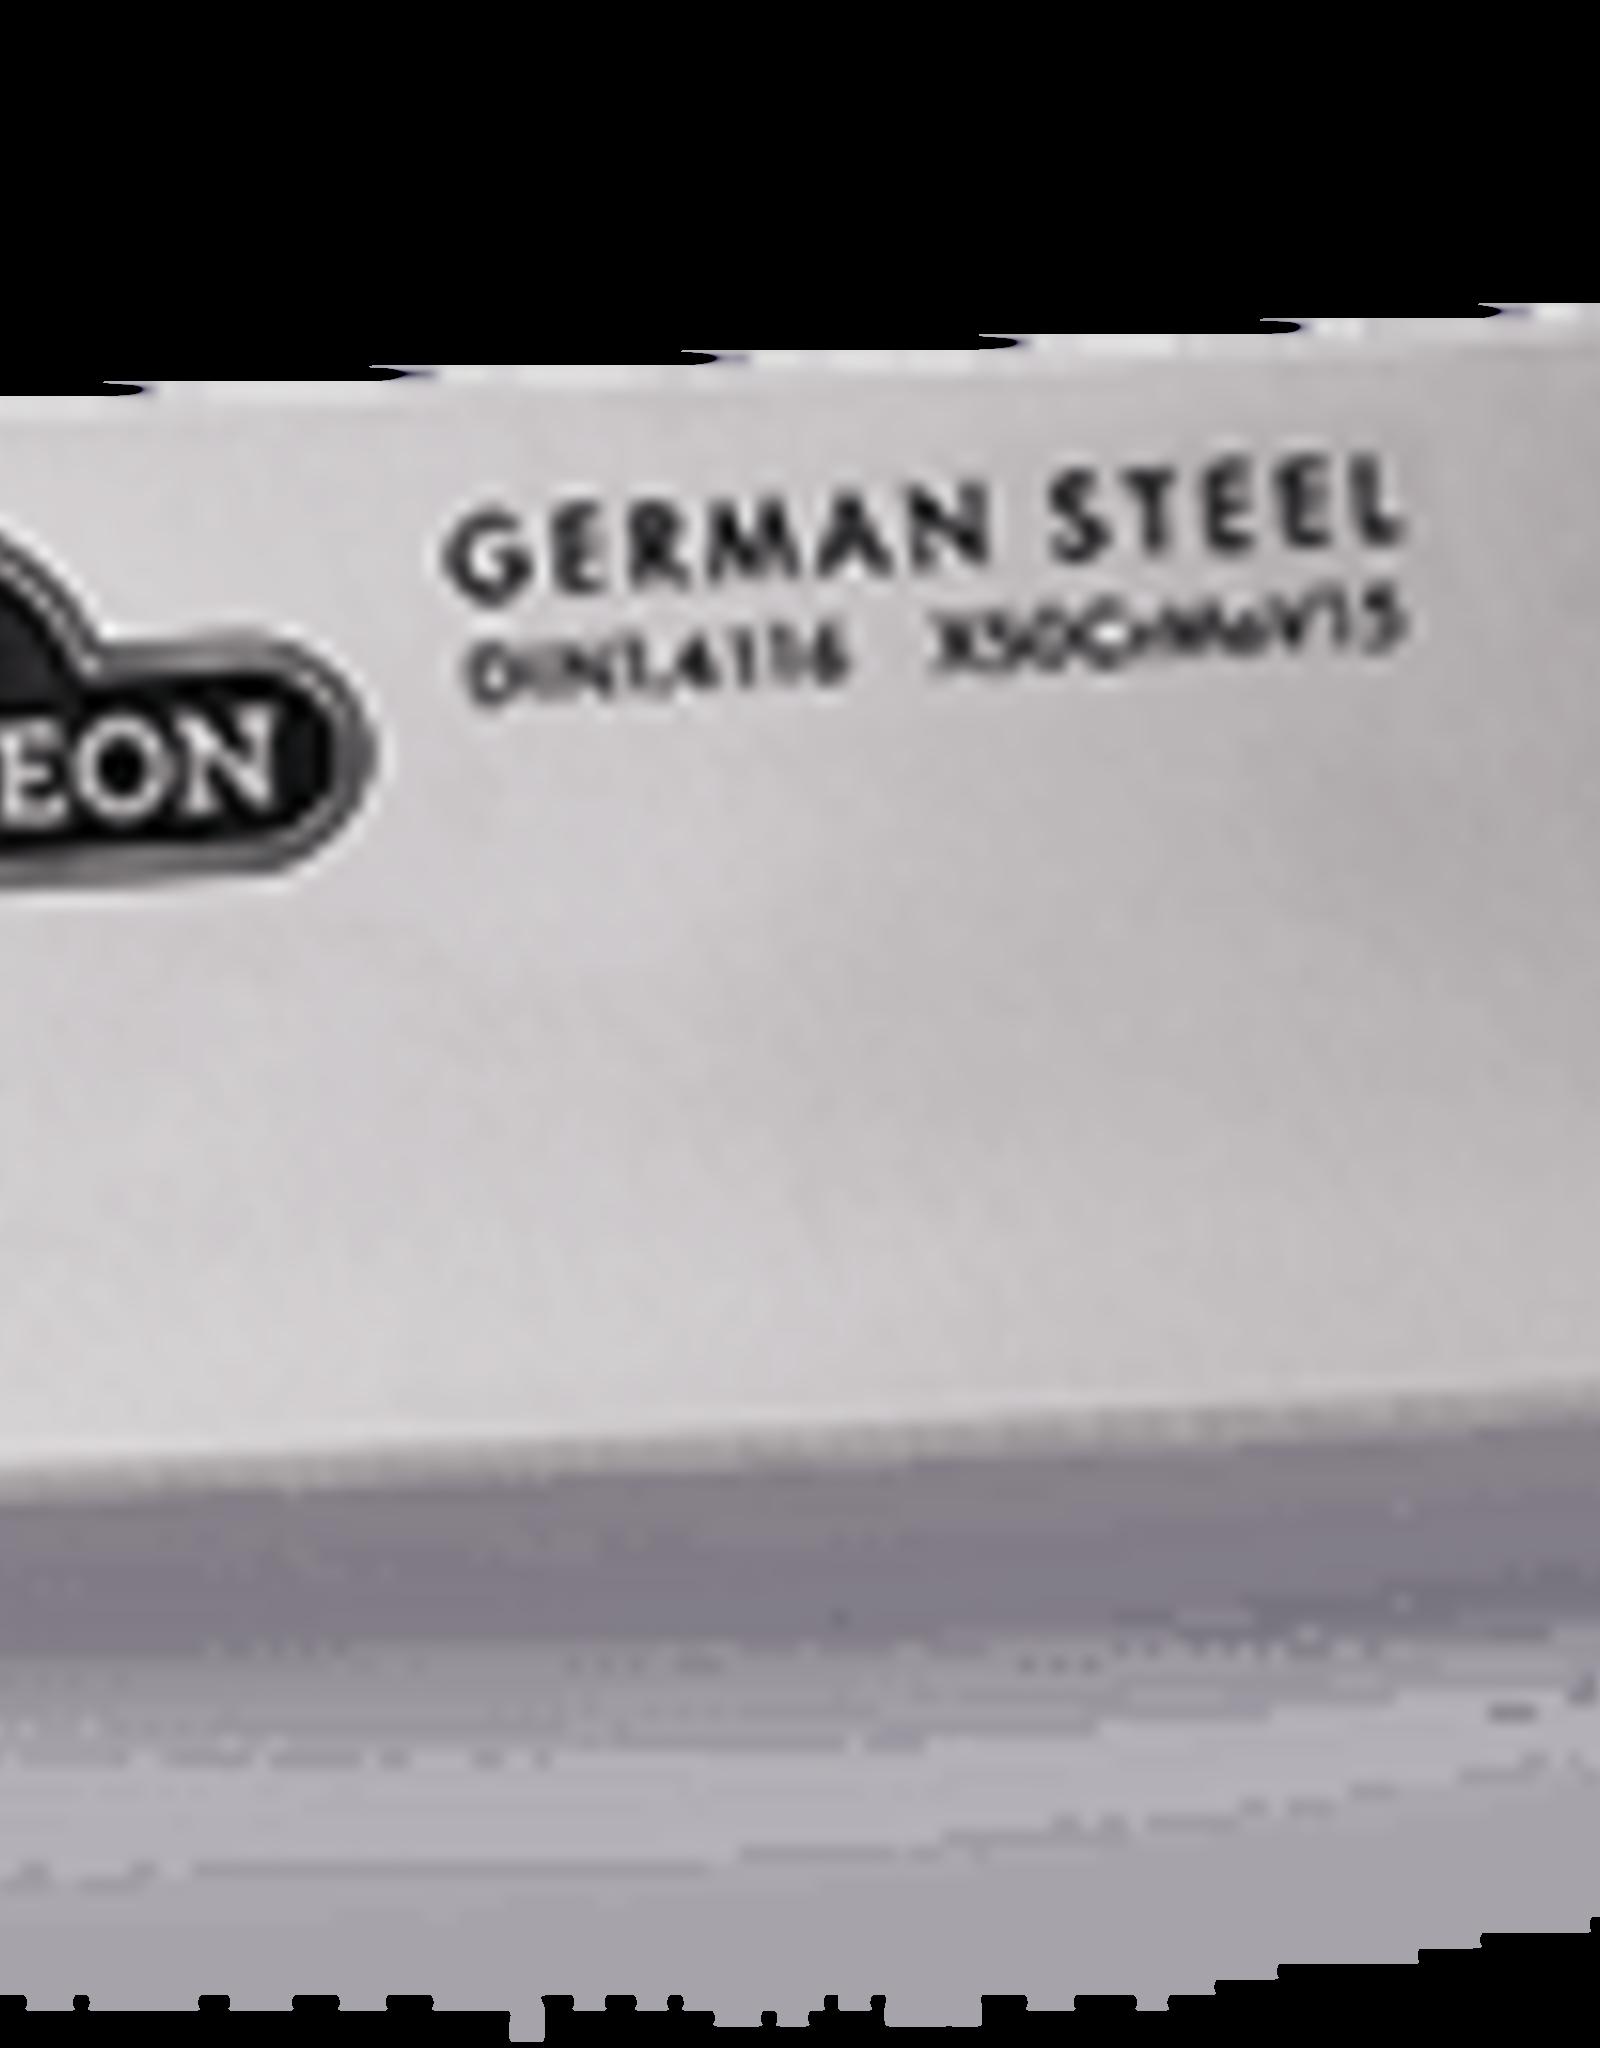 Napoleon Napoleon Carving Knife with Razor-sharp German Steel - 55213